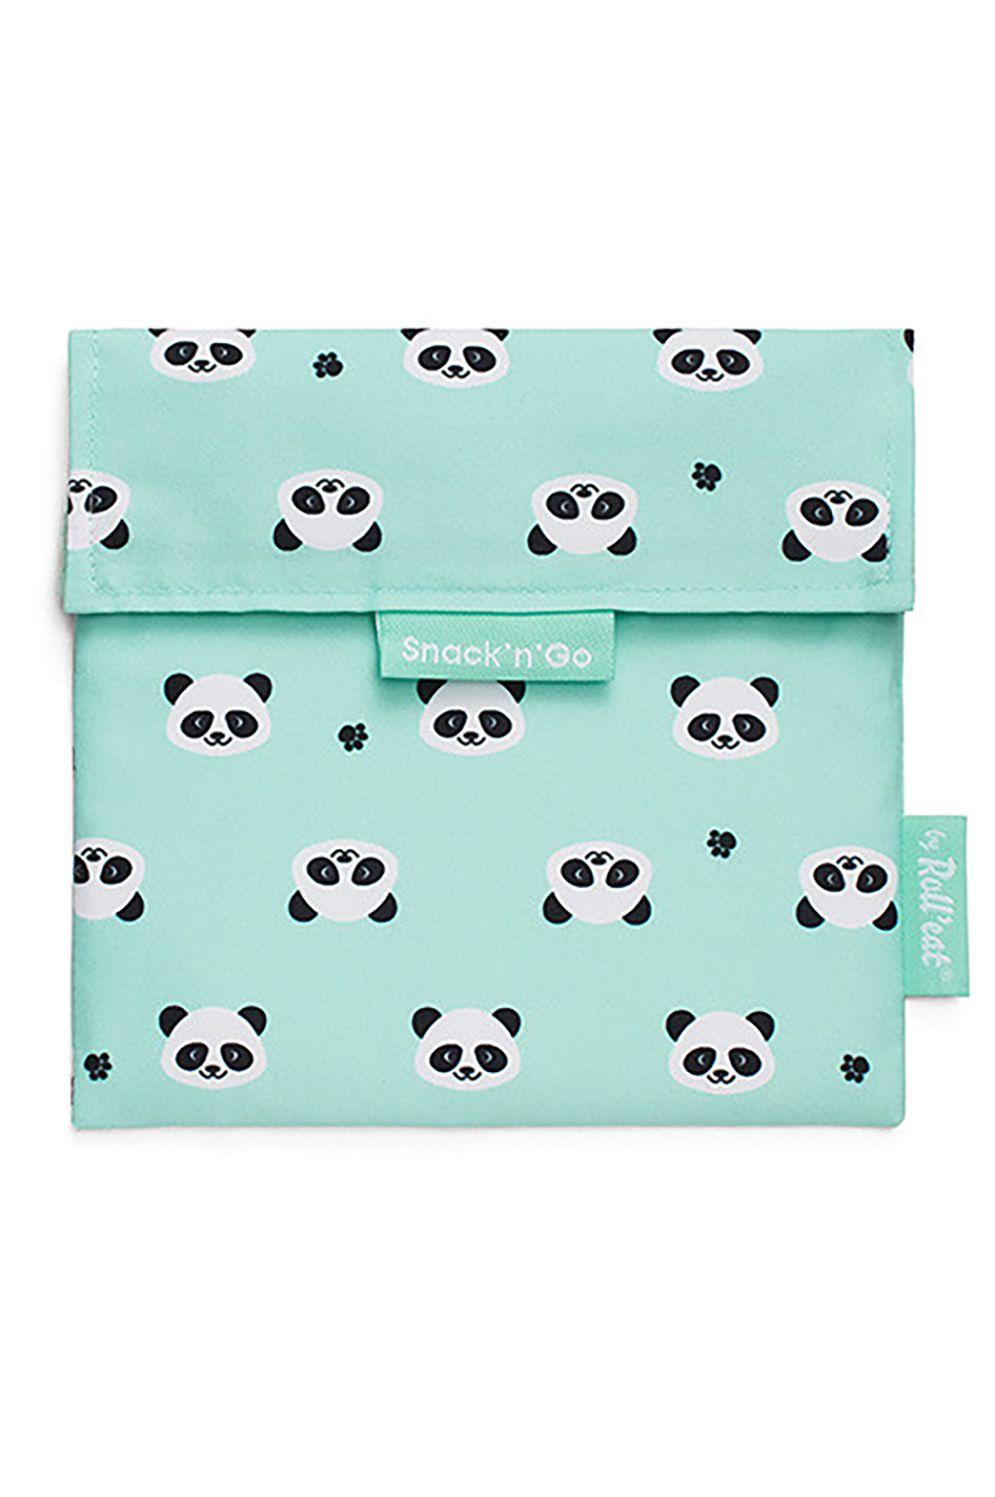 Bolsa Roll'Eat SNACK'N'GO ANIMALS Panda